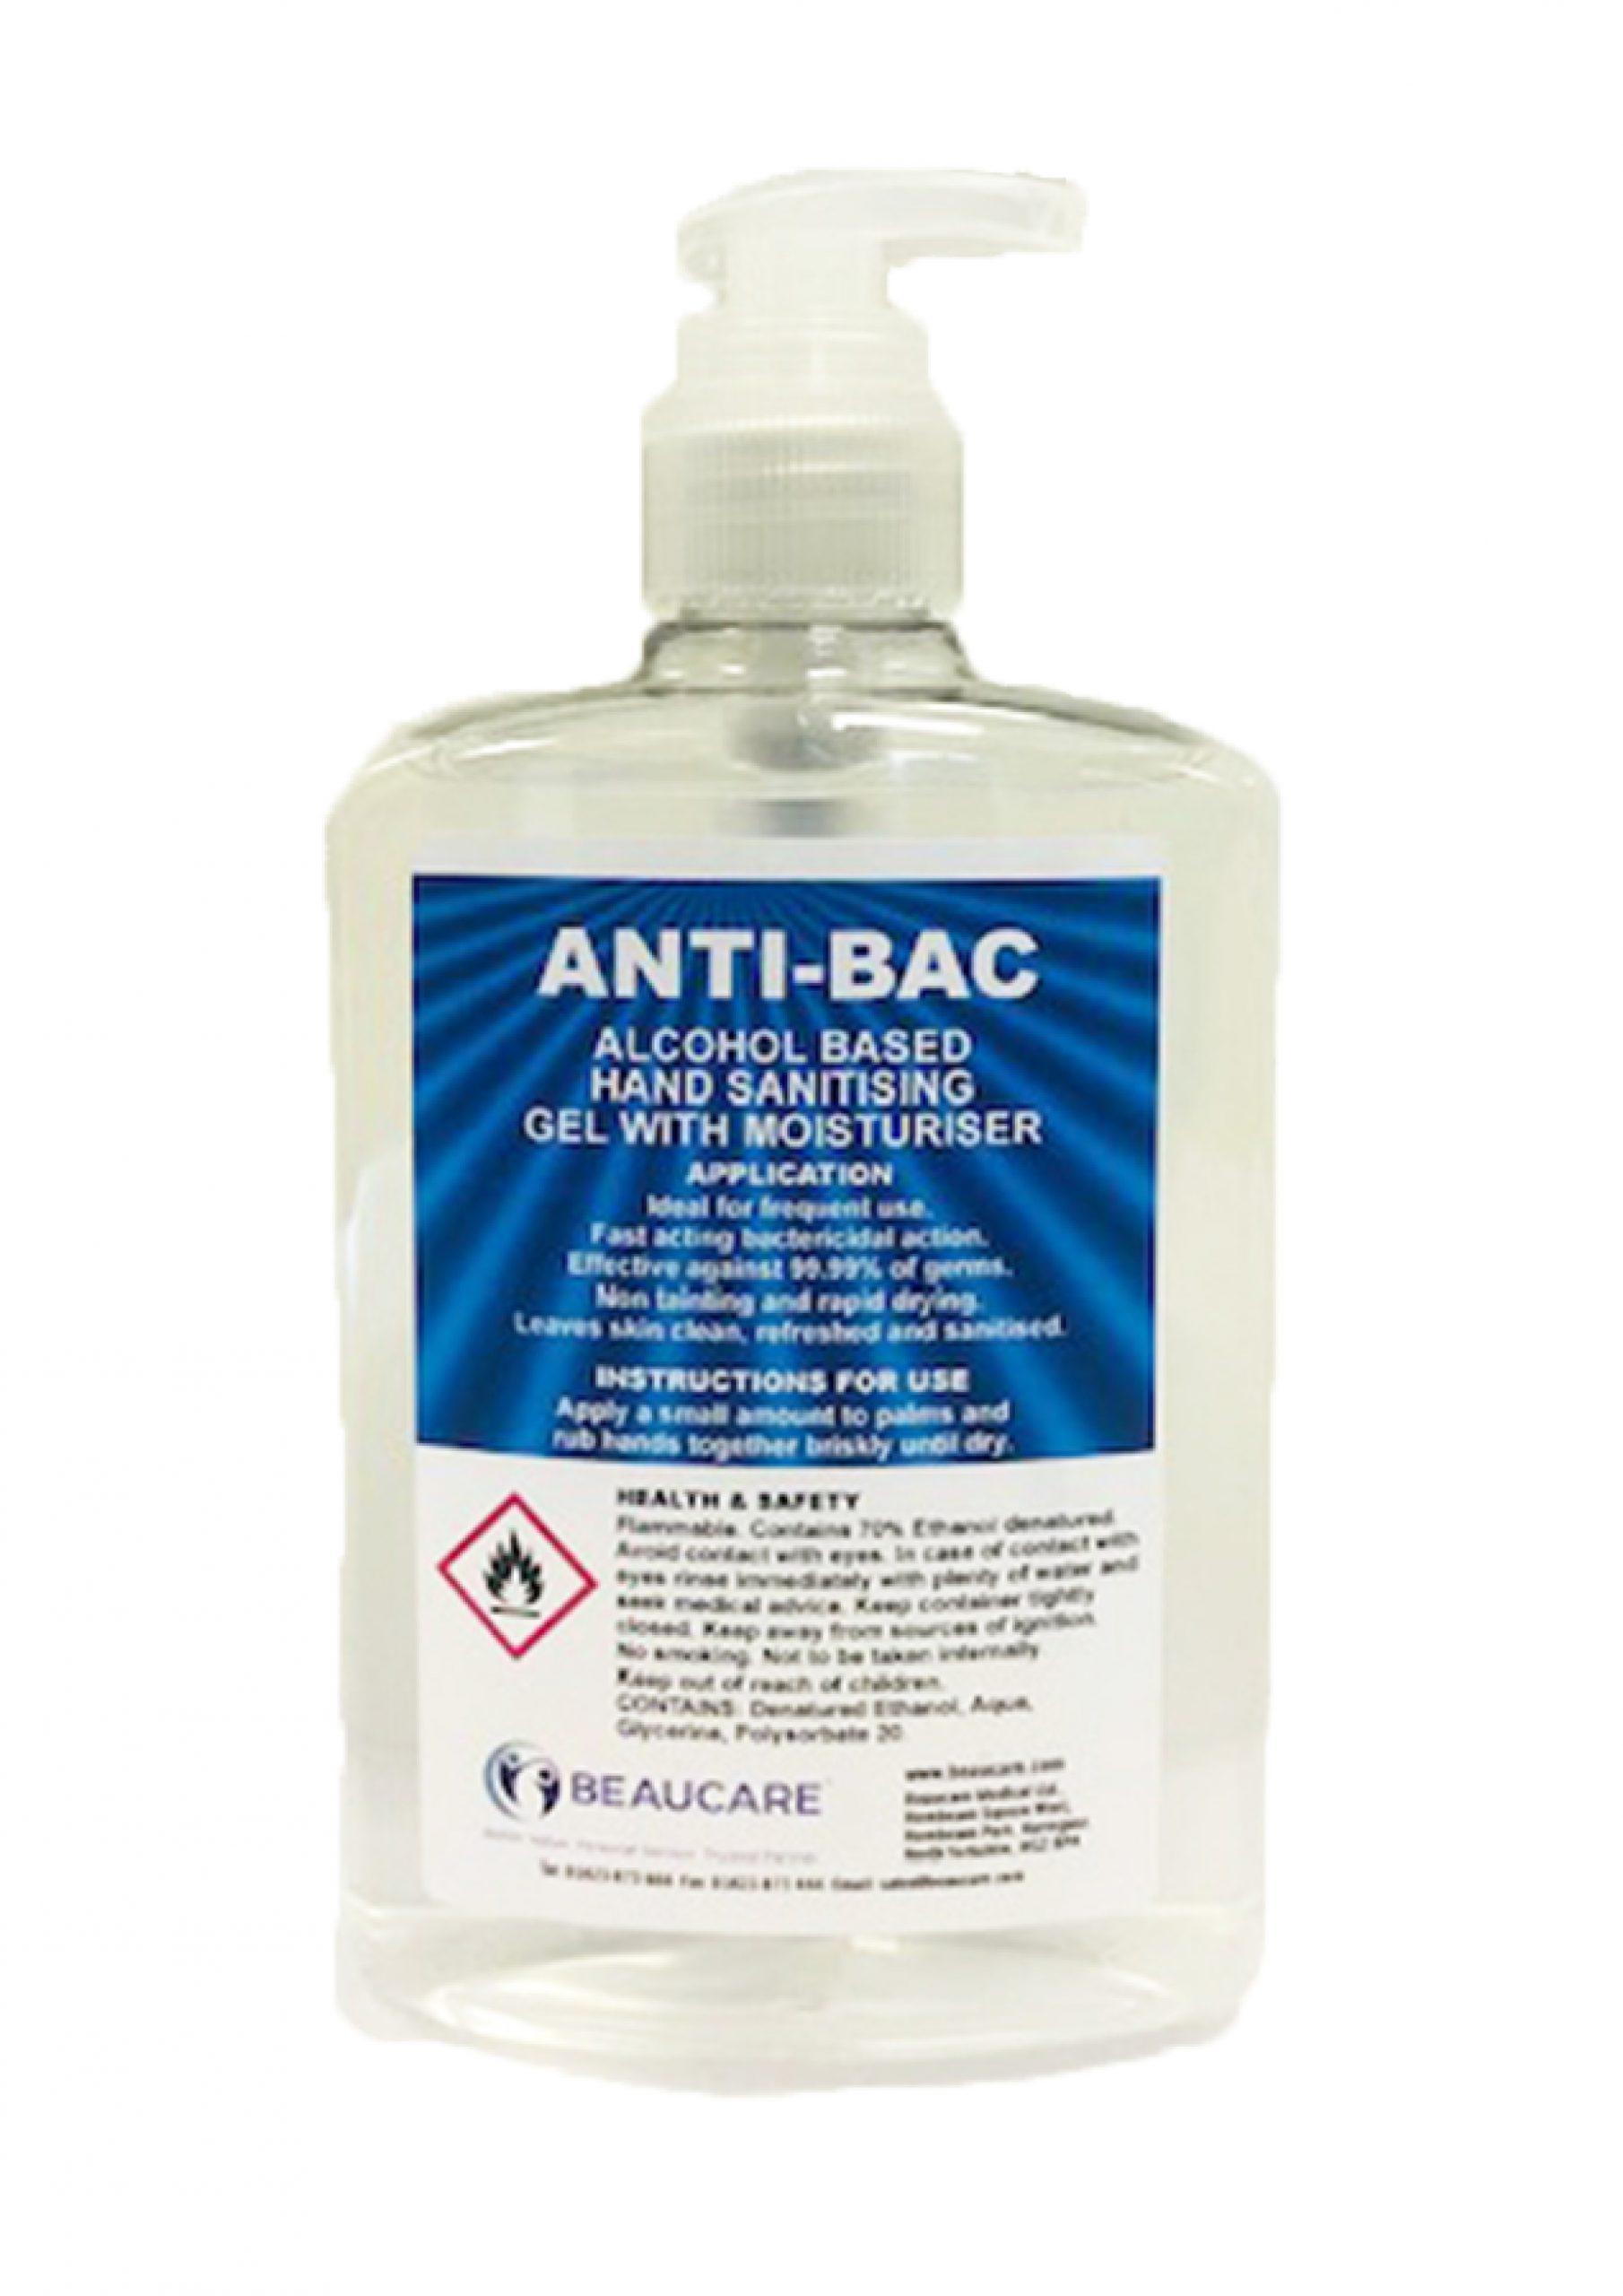 Beaucare Anti-Bac Alcohol Based Hand Sanitising Gel